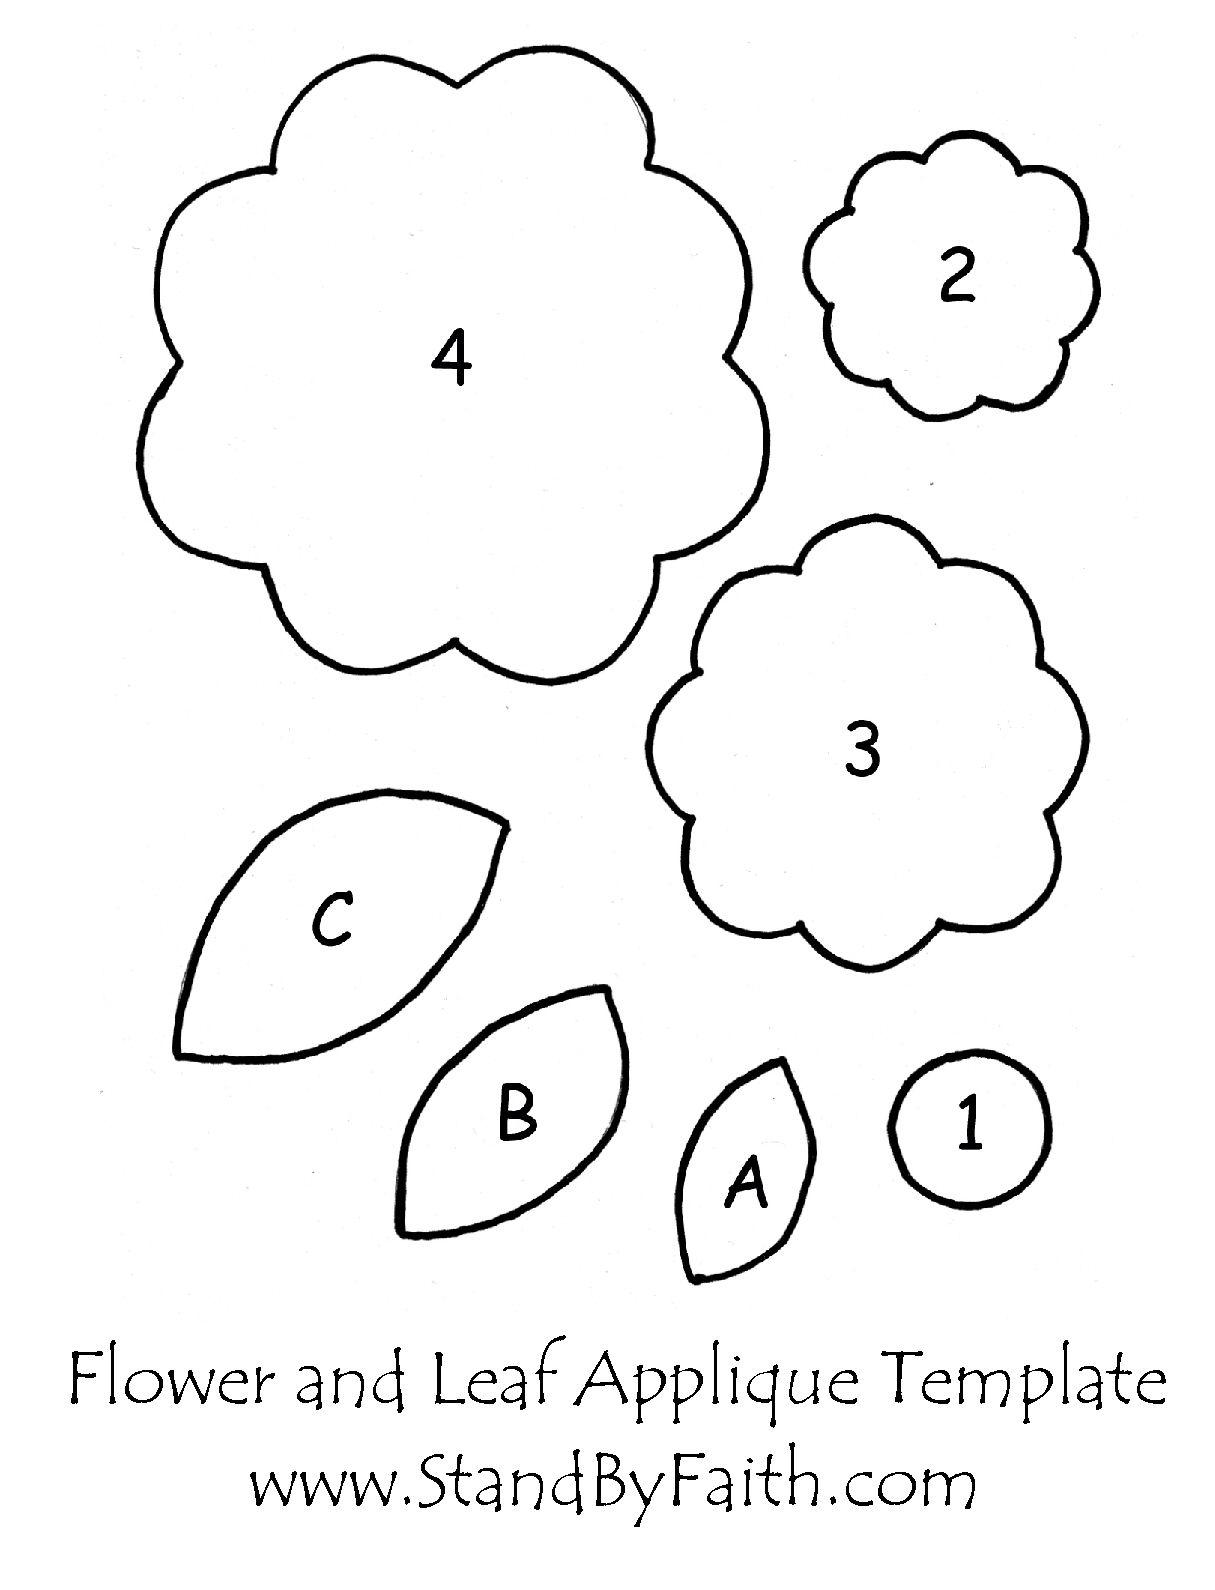 Free Flower And Leaf Applique Template Patch Aplique Pinterest